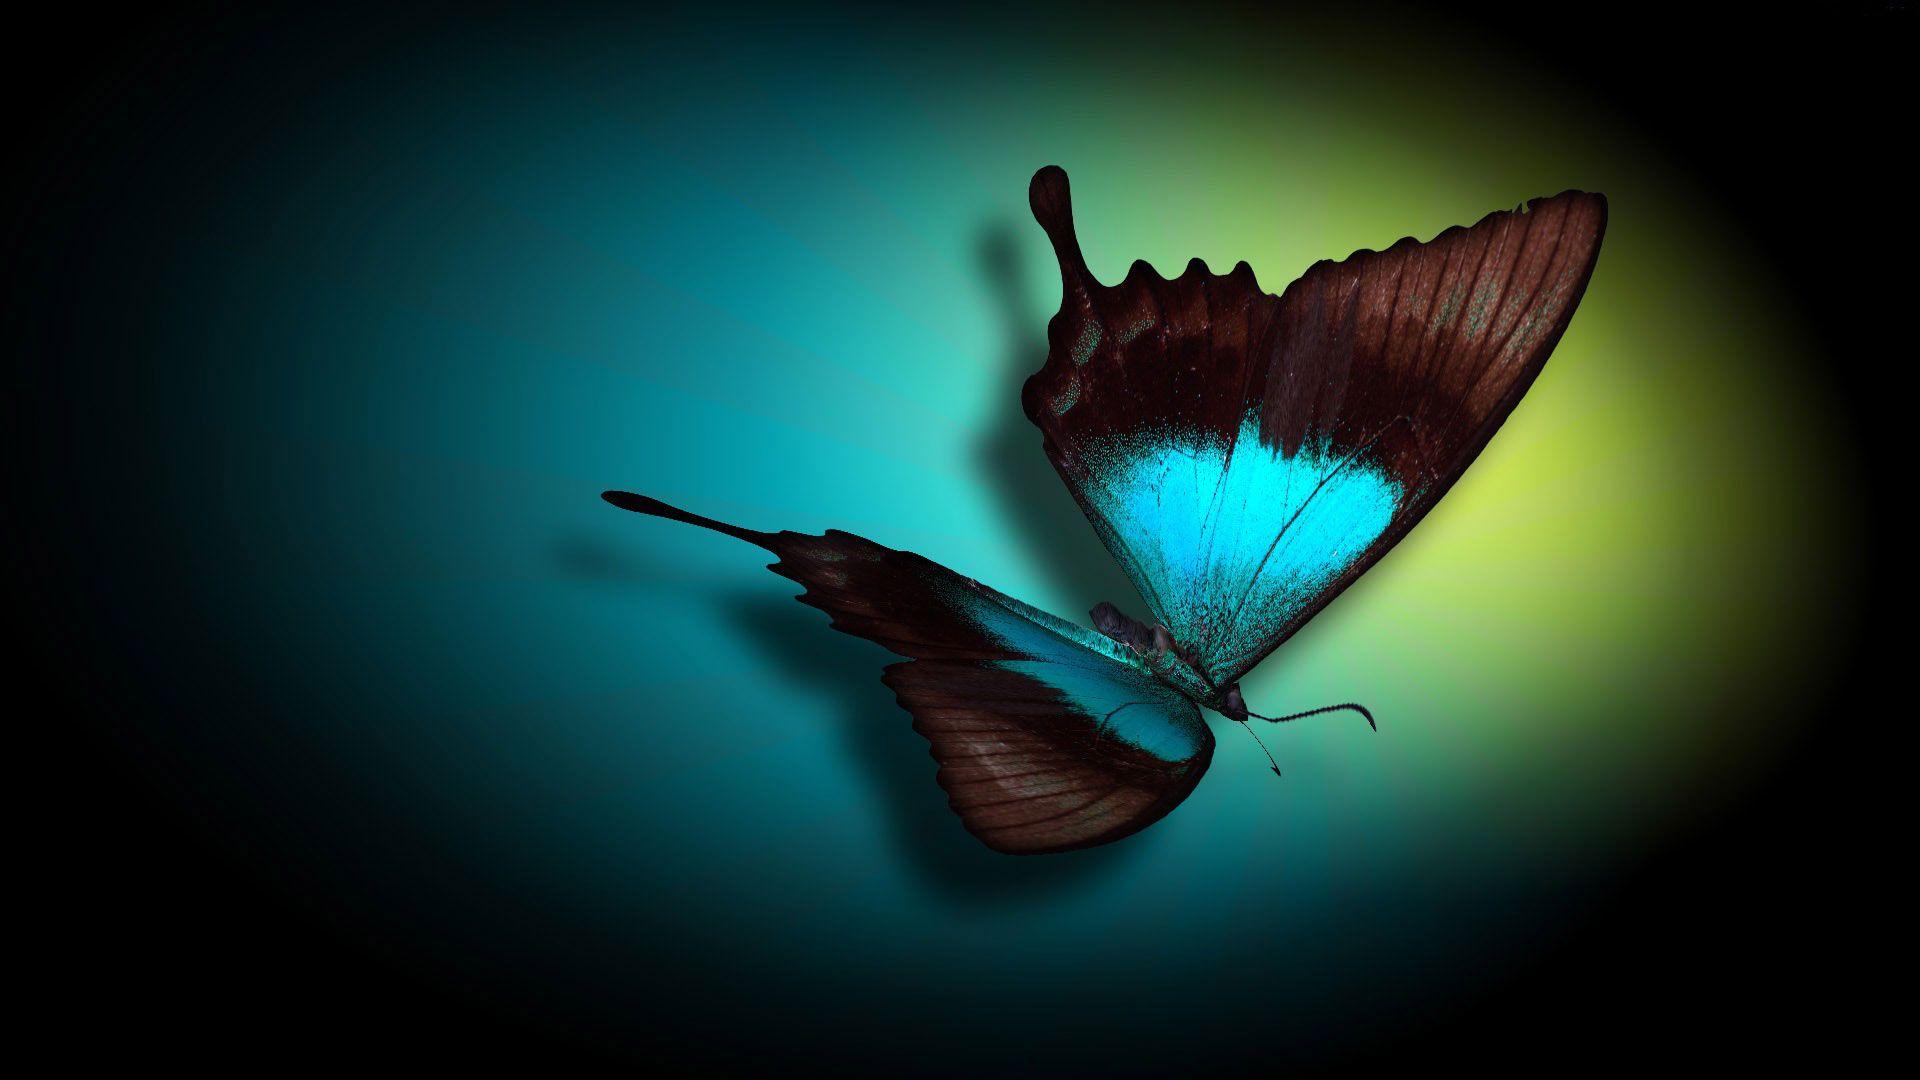 Butterfly Desktop Background 3 Butterfly Wallpaper Computer Wallpaper Butterfly Images